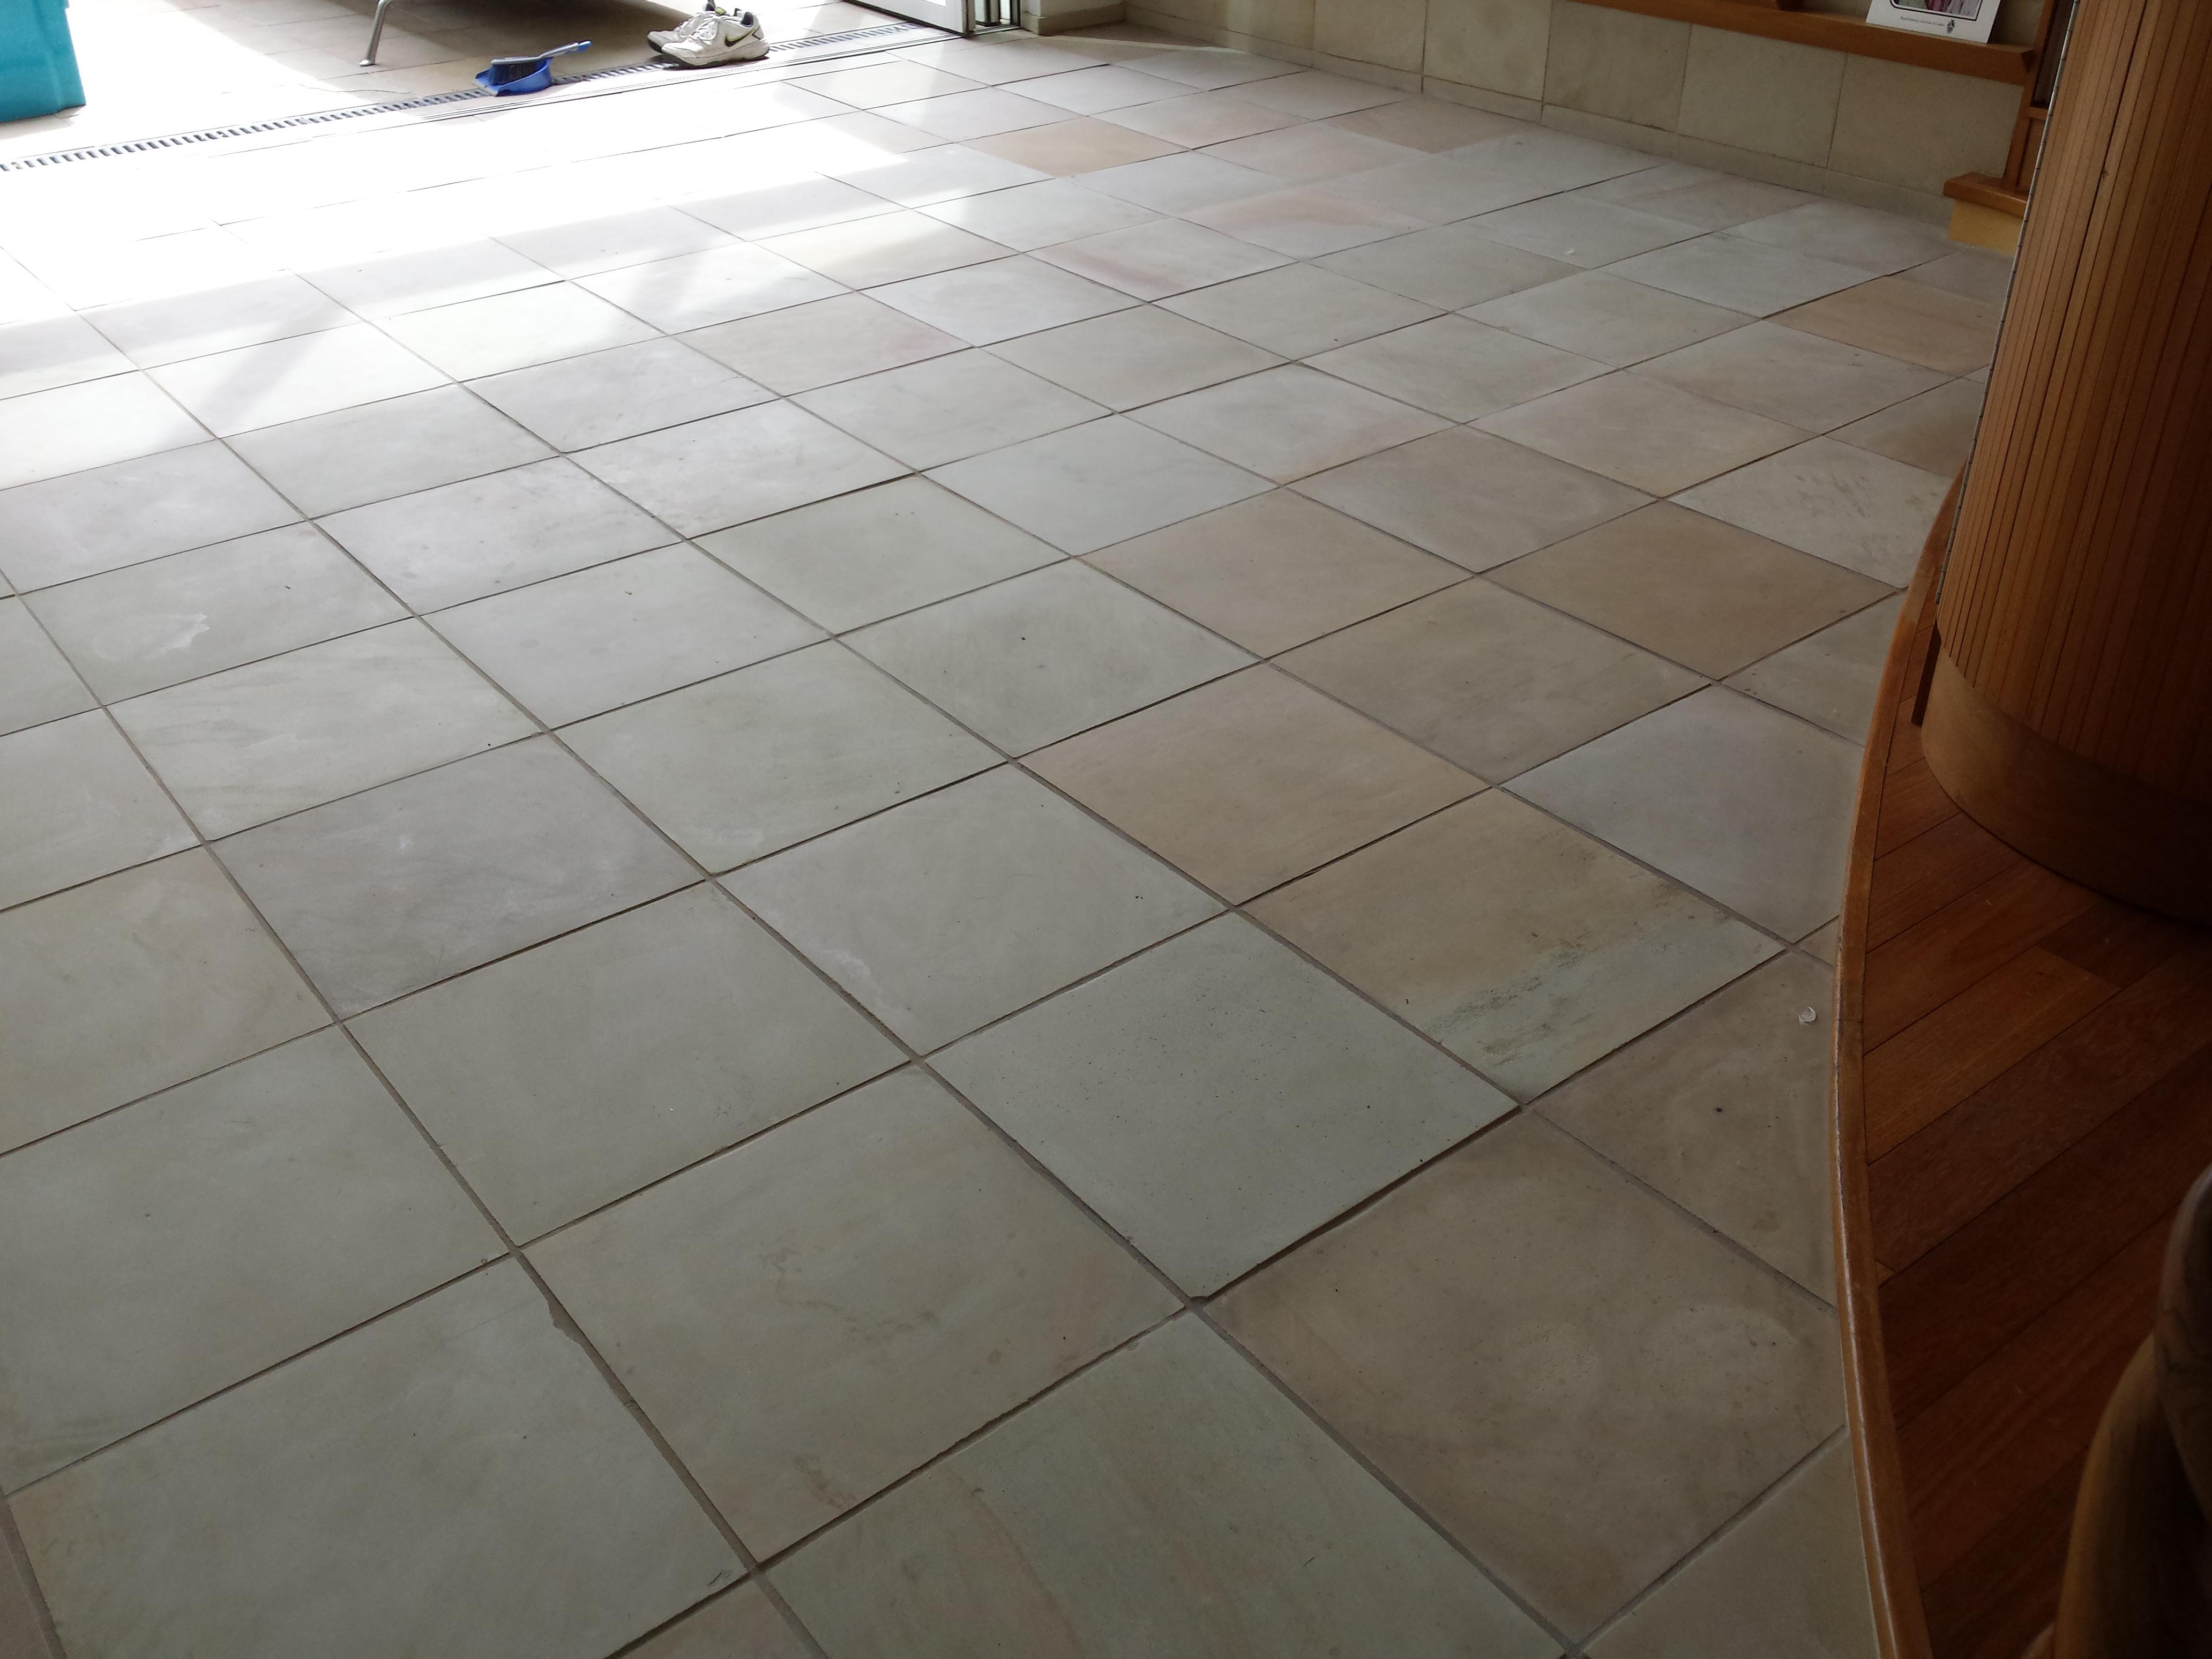 Asphalt tile floor